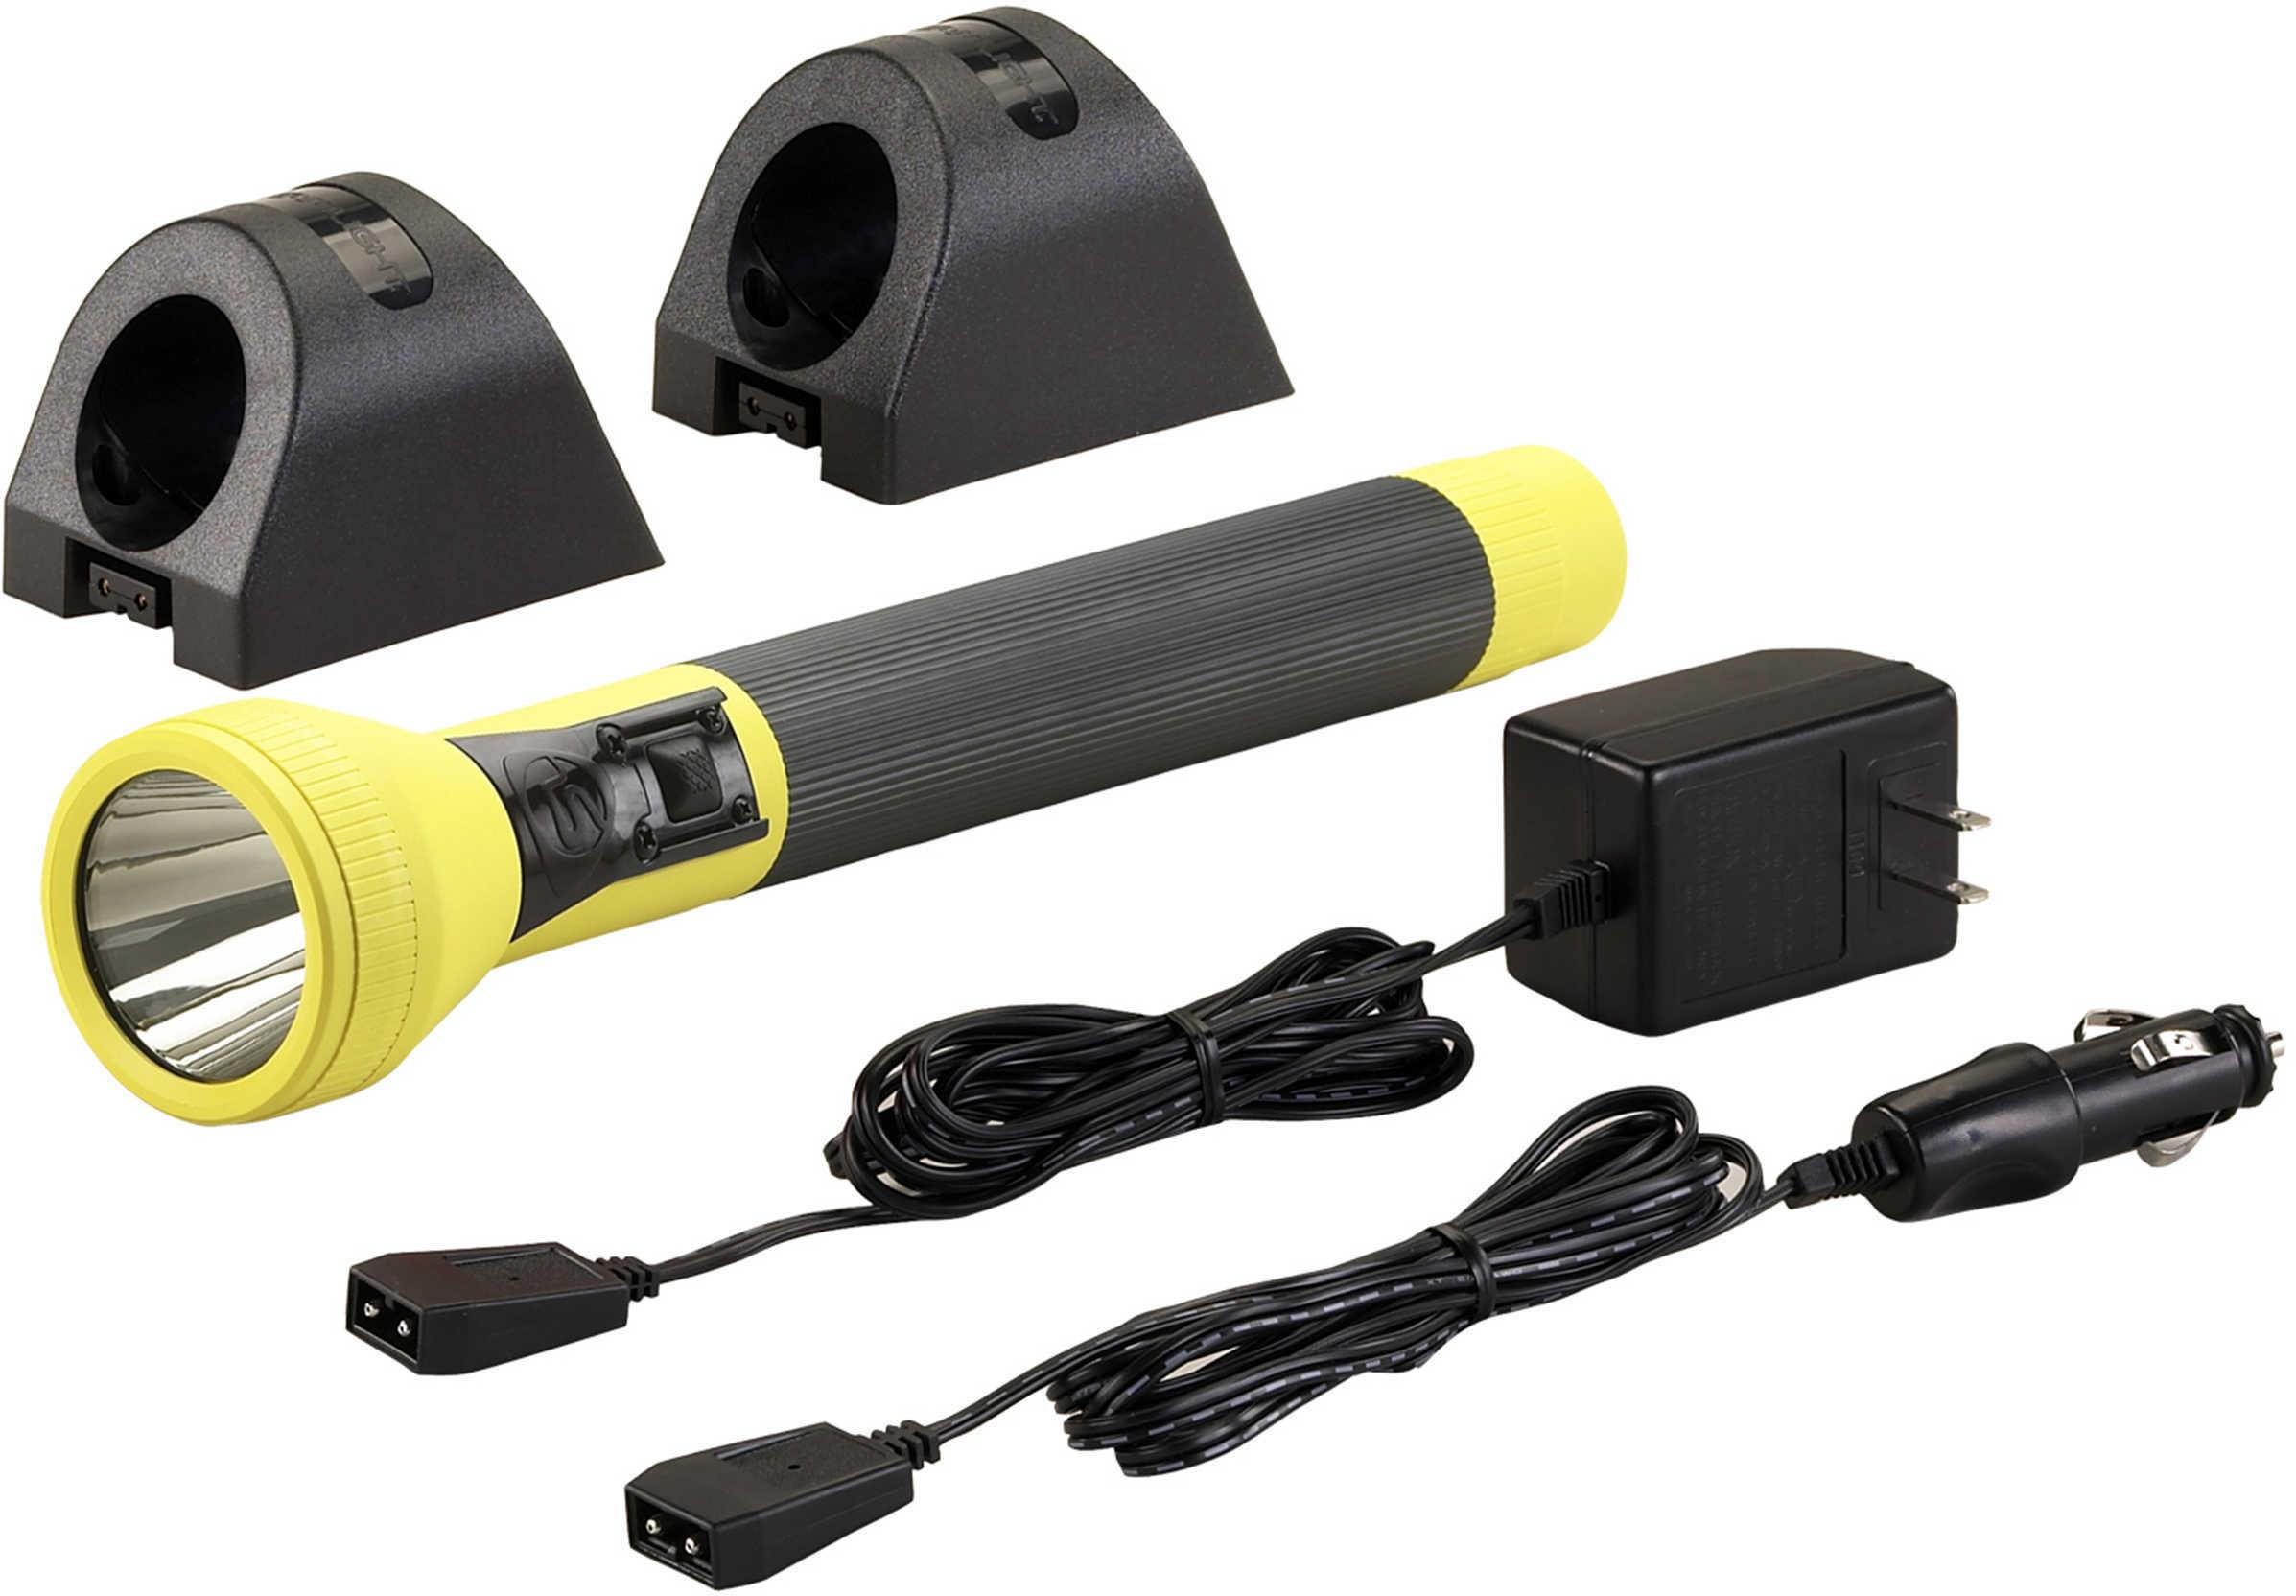 Streamlight SL-20Lp Flashlight Black, NiMH, No Charger Md: 25300